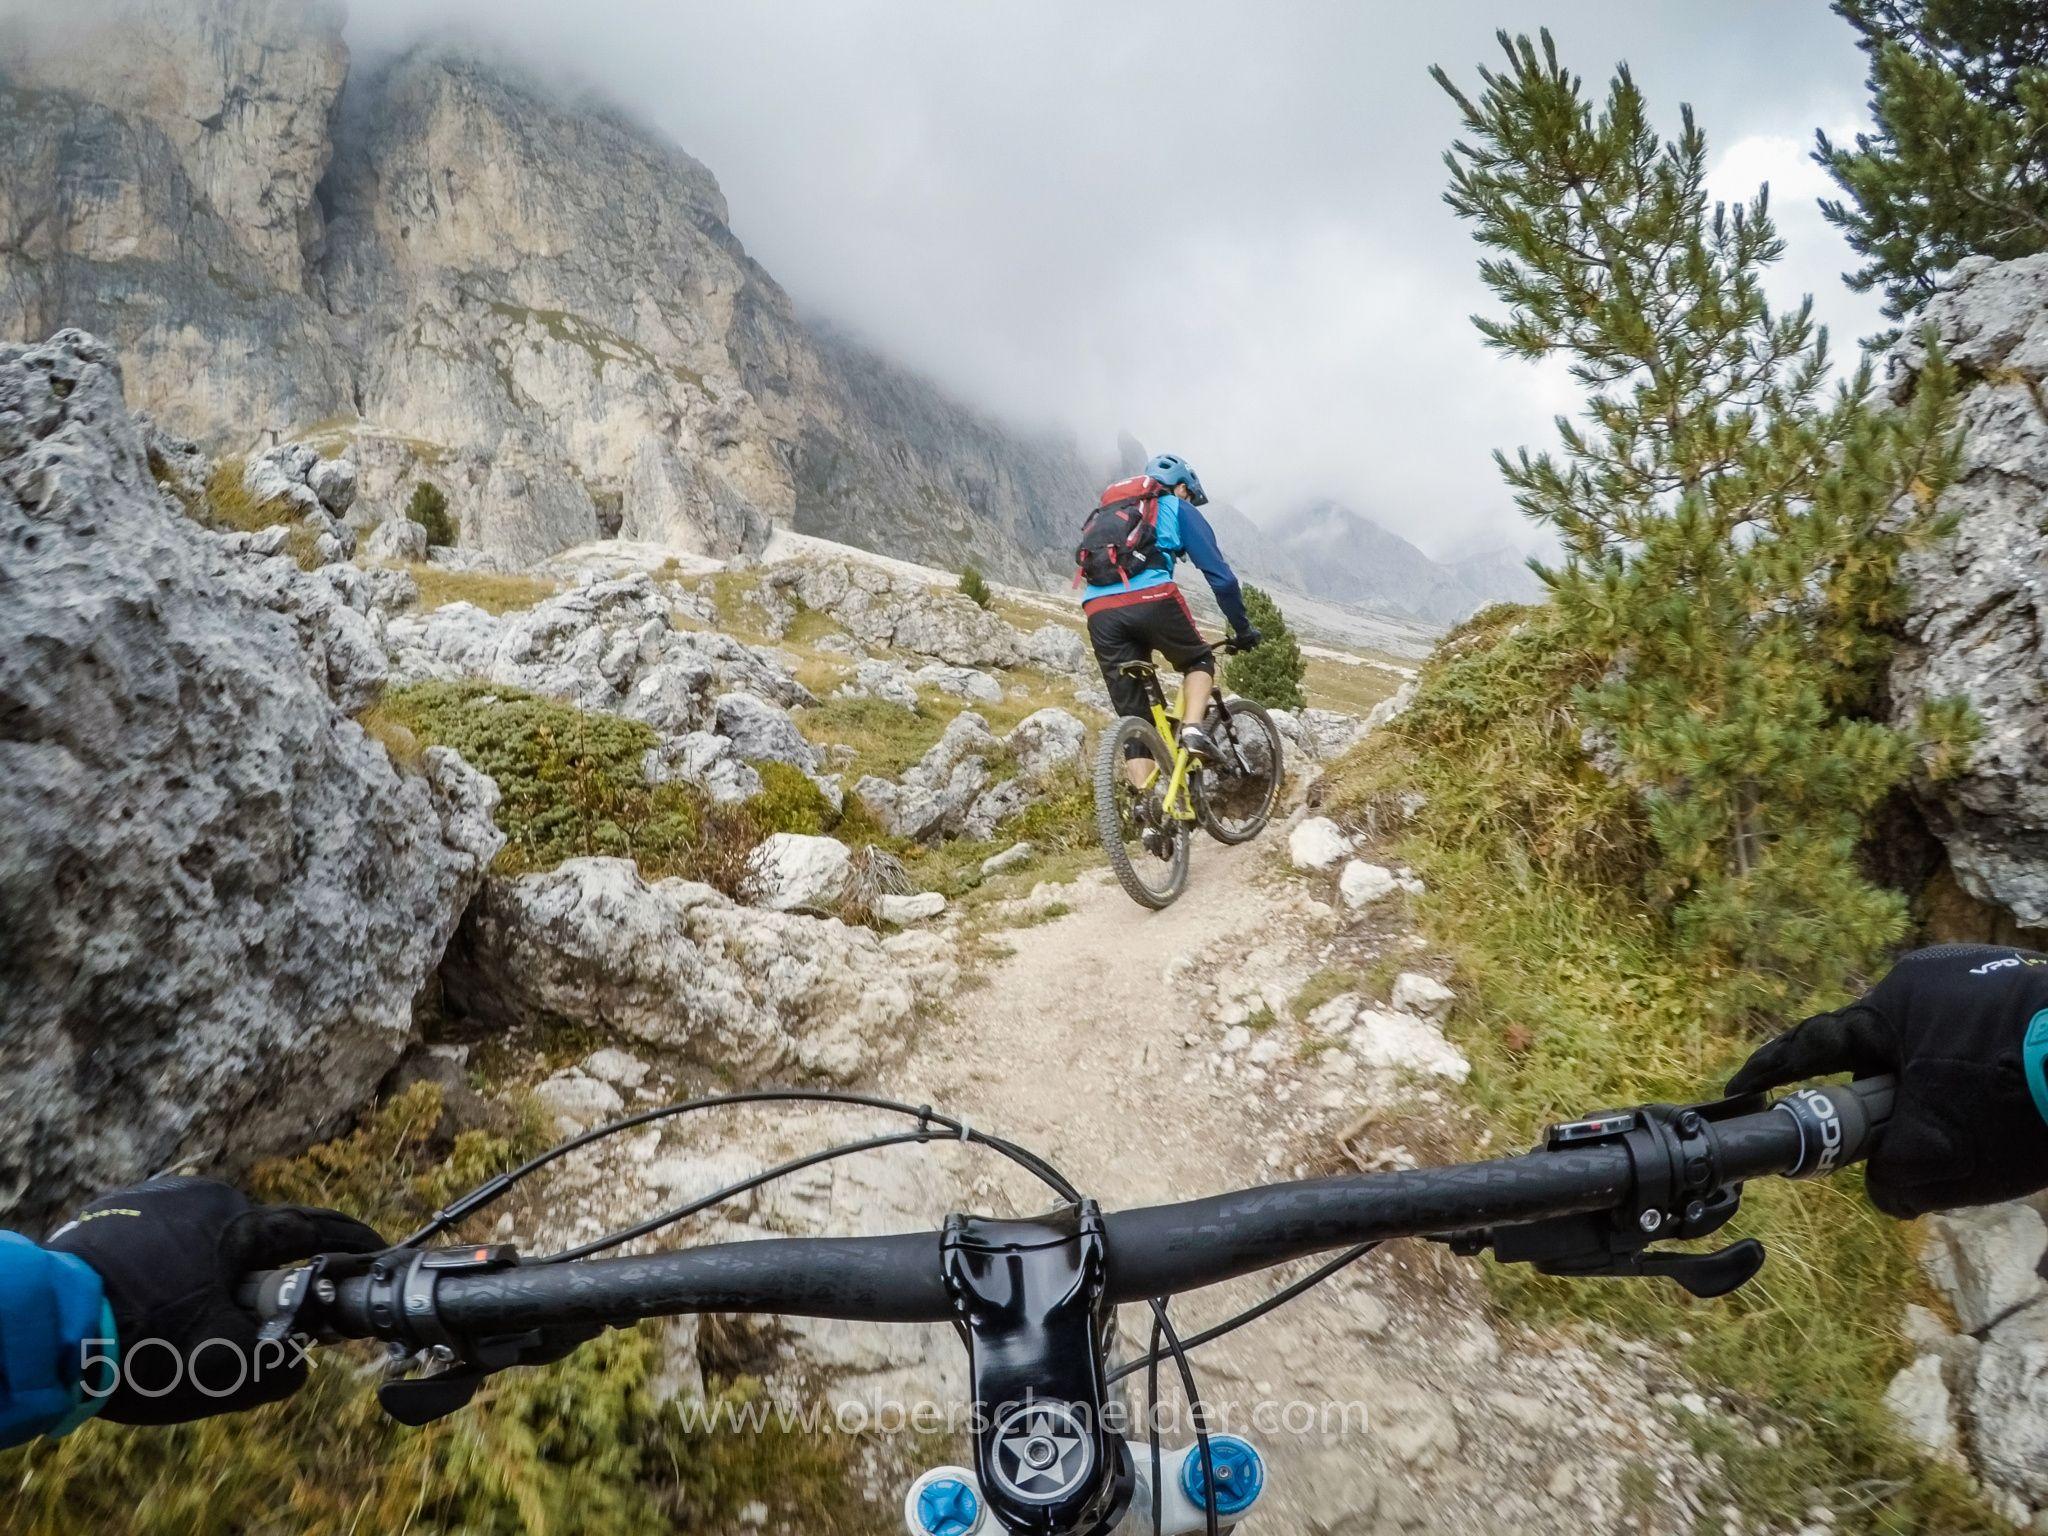 Pin By Thai Wristbands On Mountain Biking Mountain Biking Photography Mountain Biking Mountain Bike Reviews